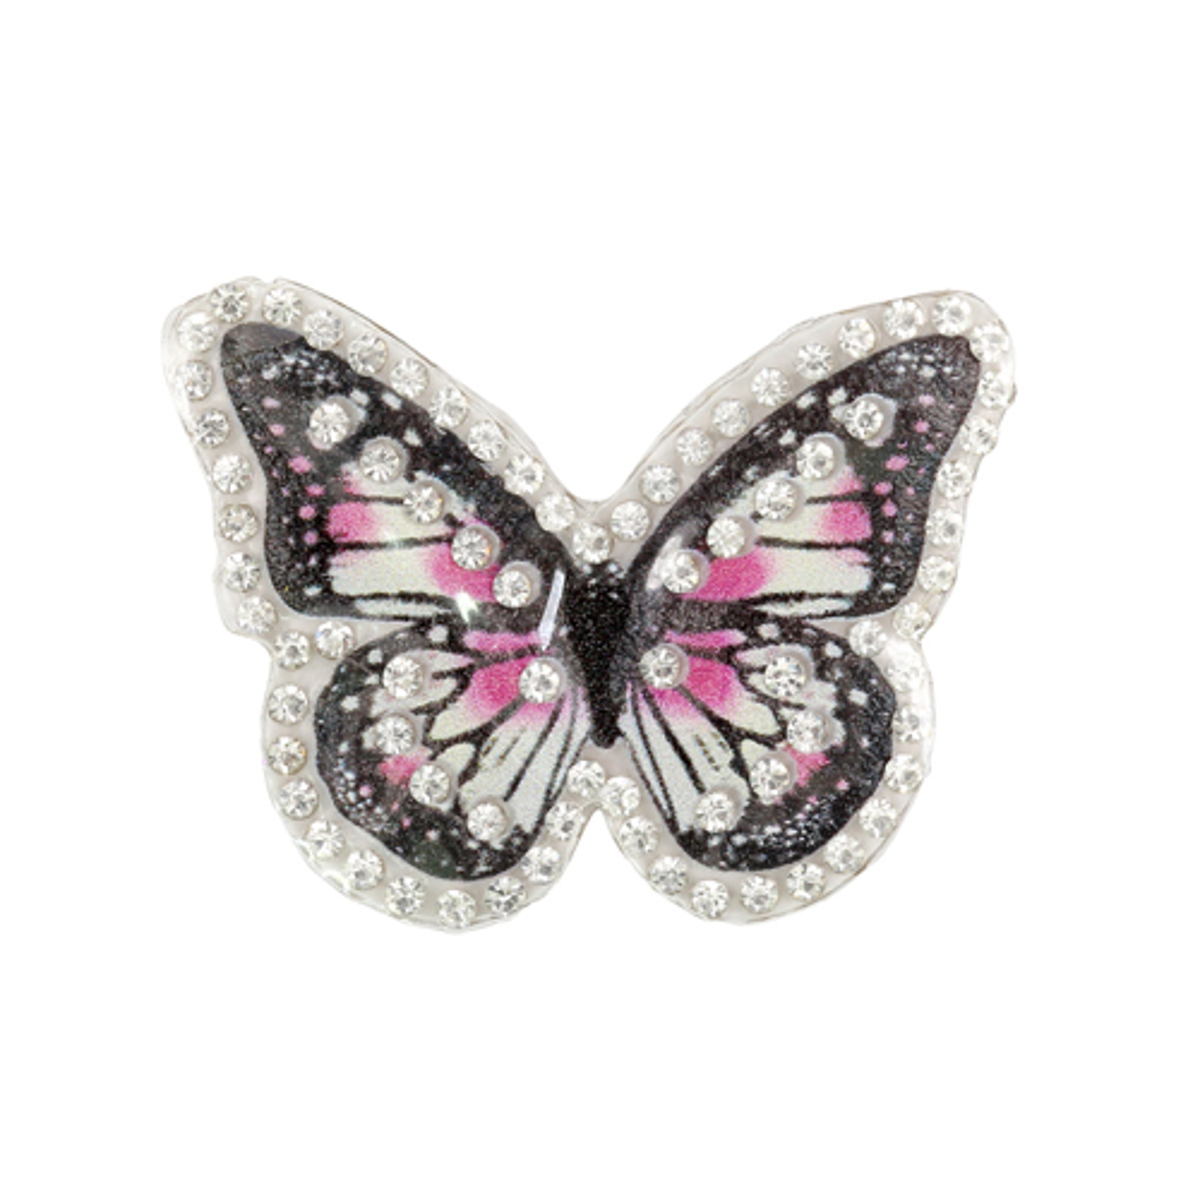 ГУ14234 Термоаппликация Бабочка 50*37мм, черно-розовая